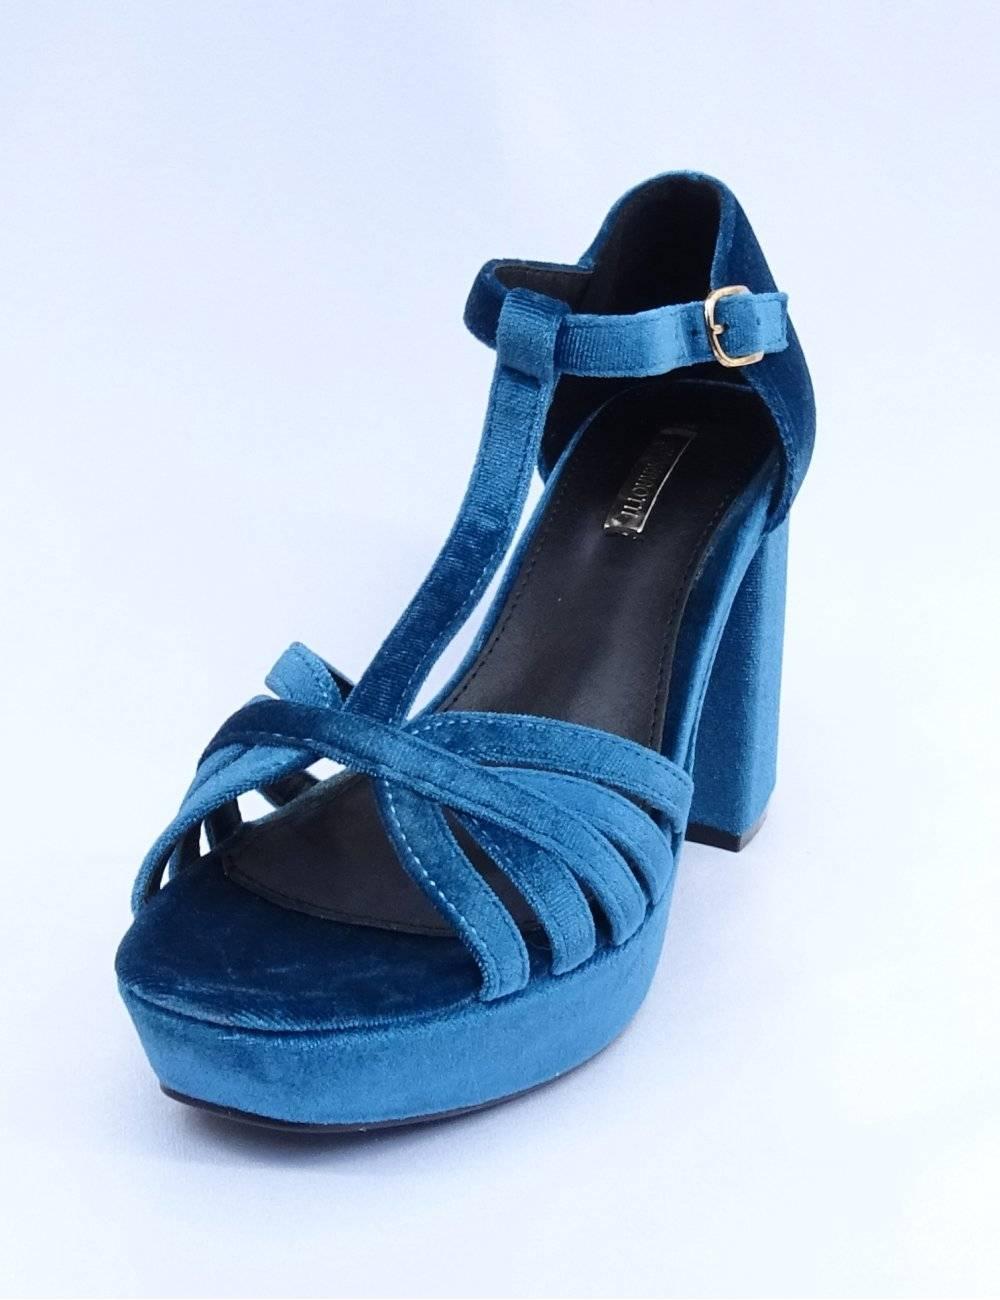 Sandalias Azules Fiesta